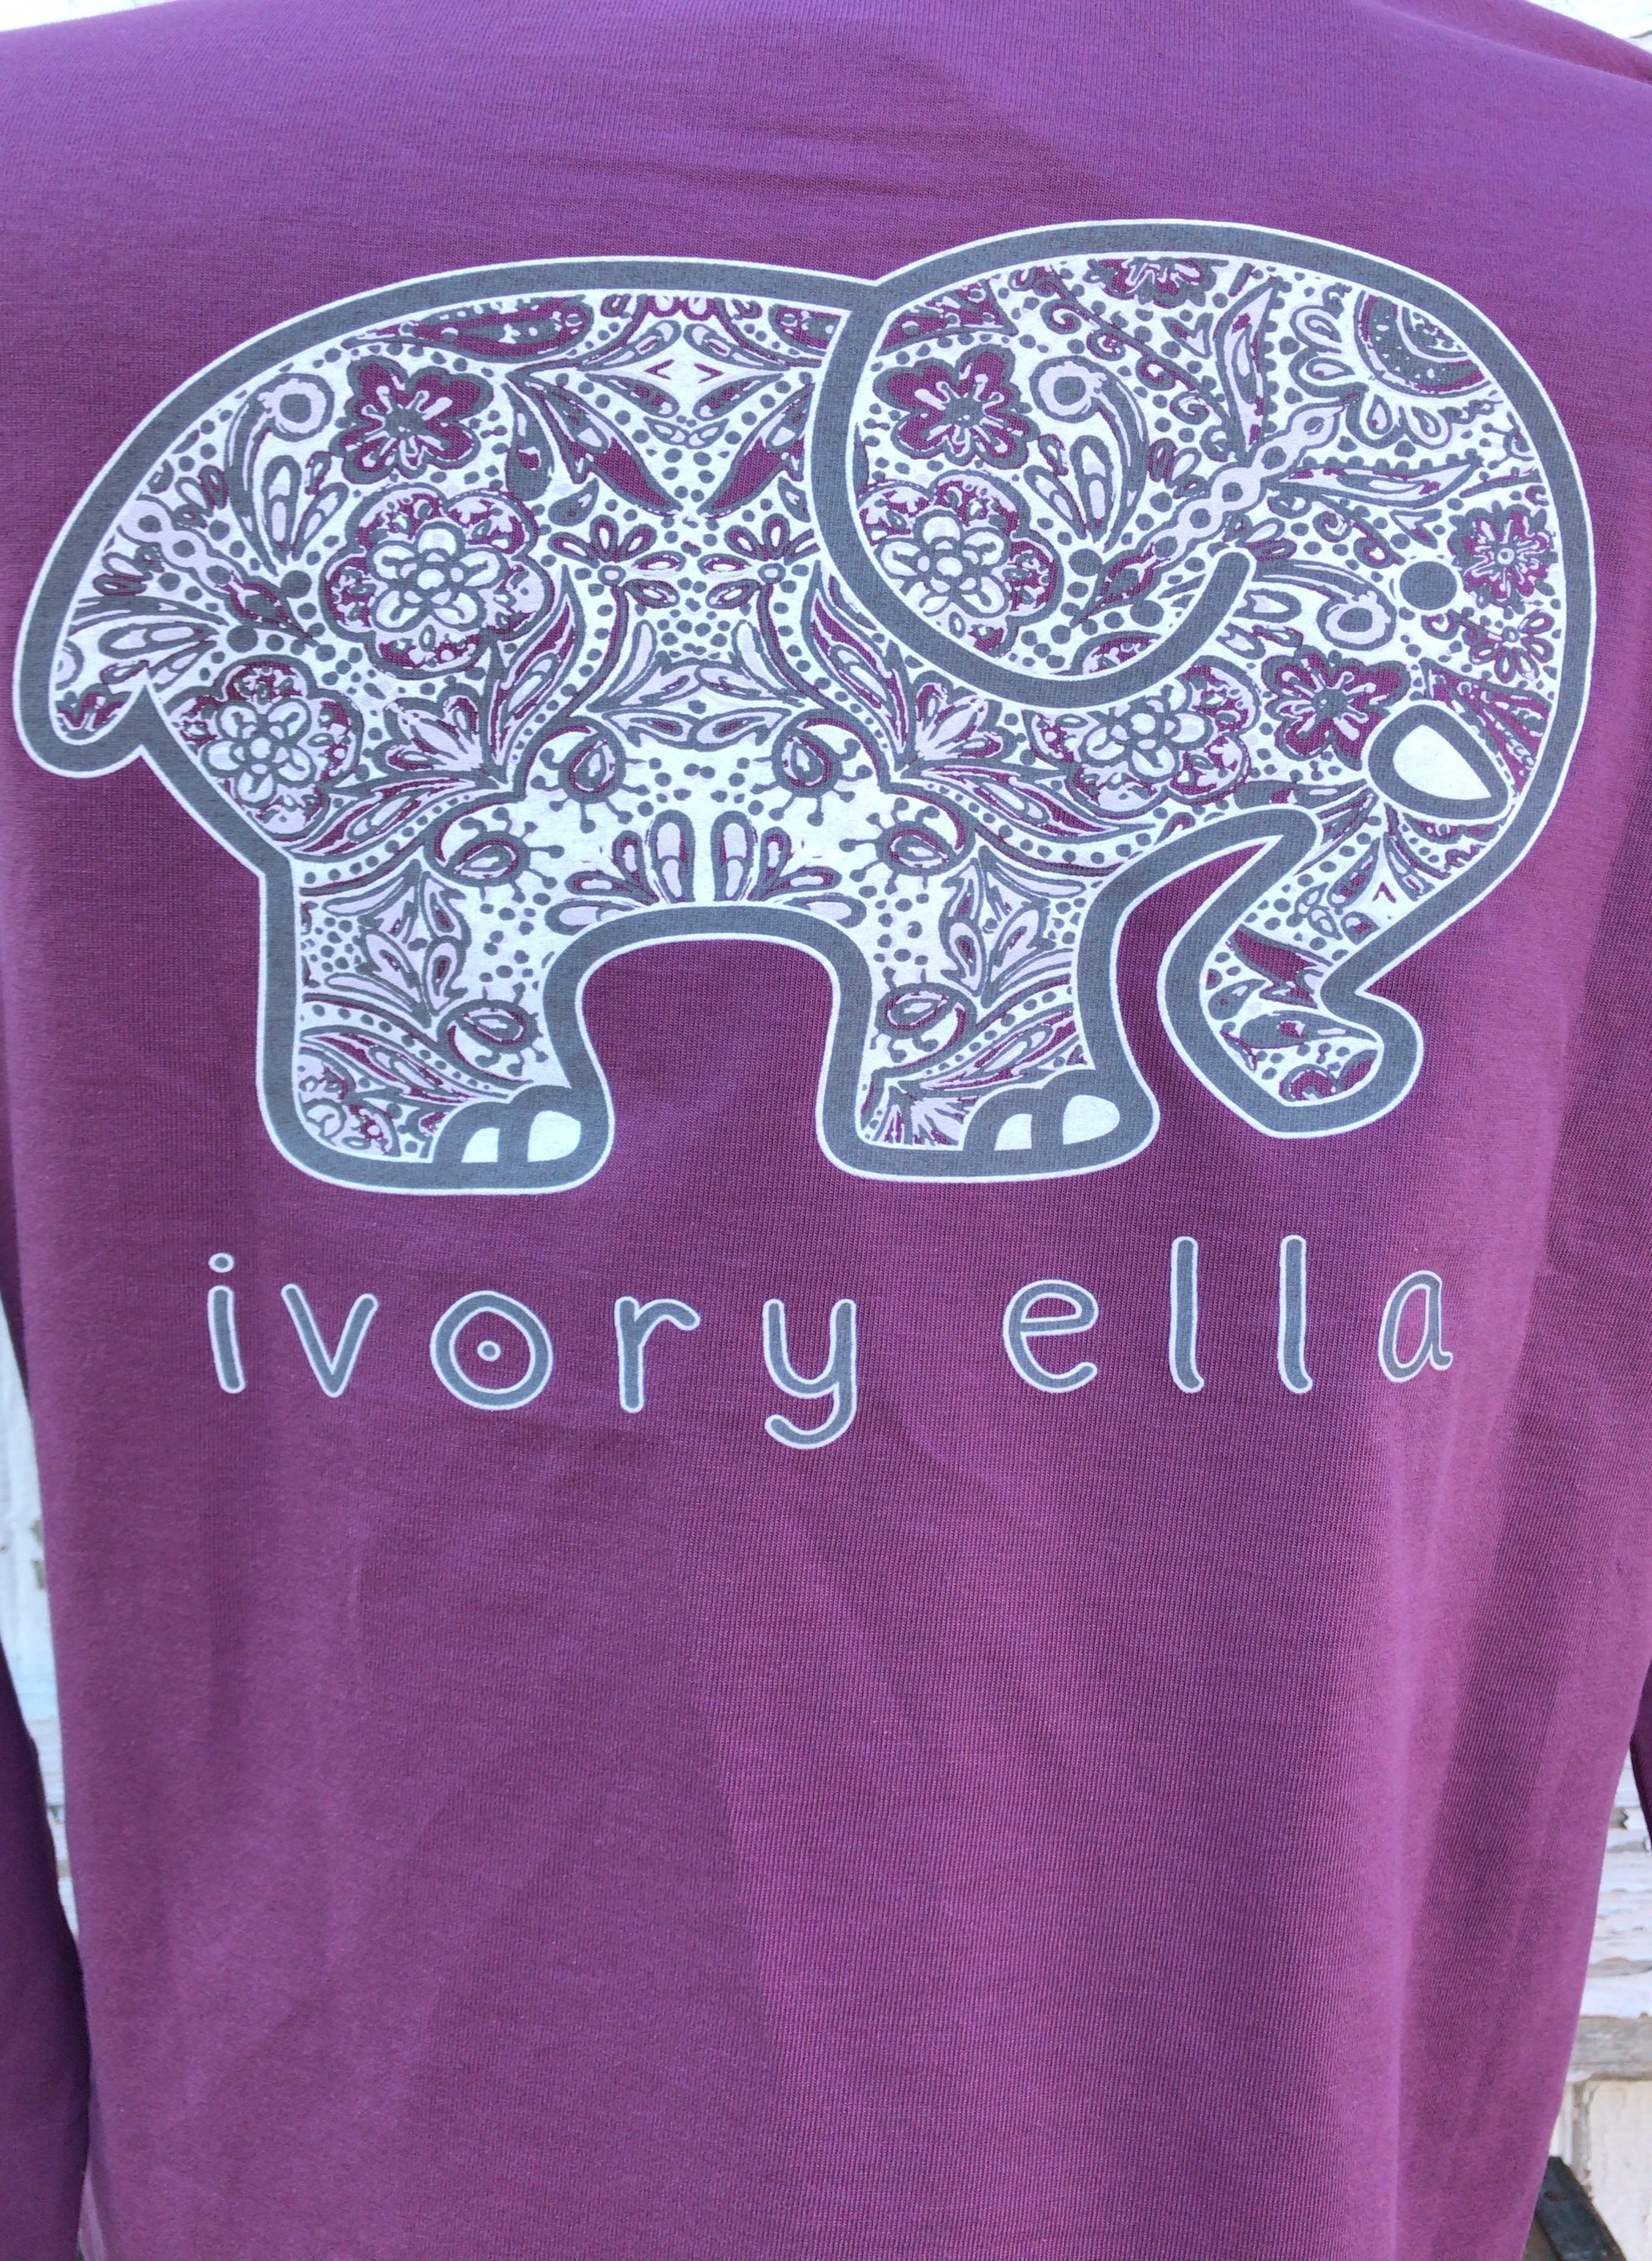 b8cc59ebc Ivory Ella Women's Long Sleeve T-Shirt – Berry – Winterwood Gift ...